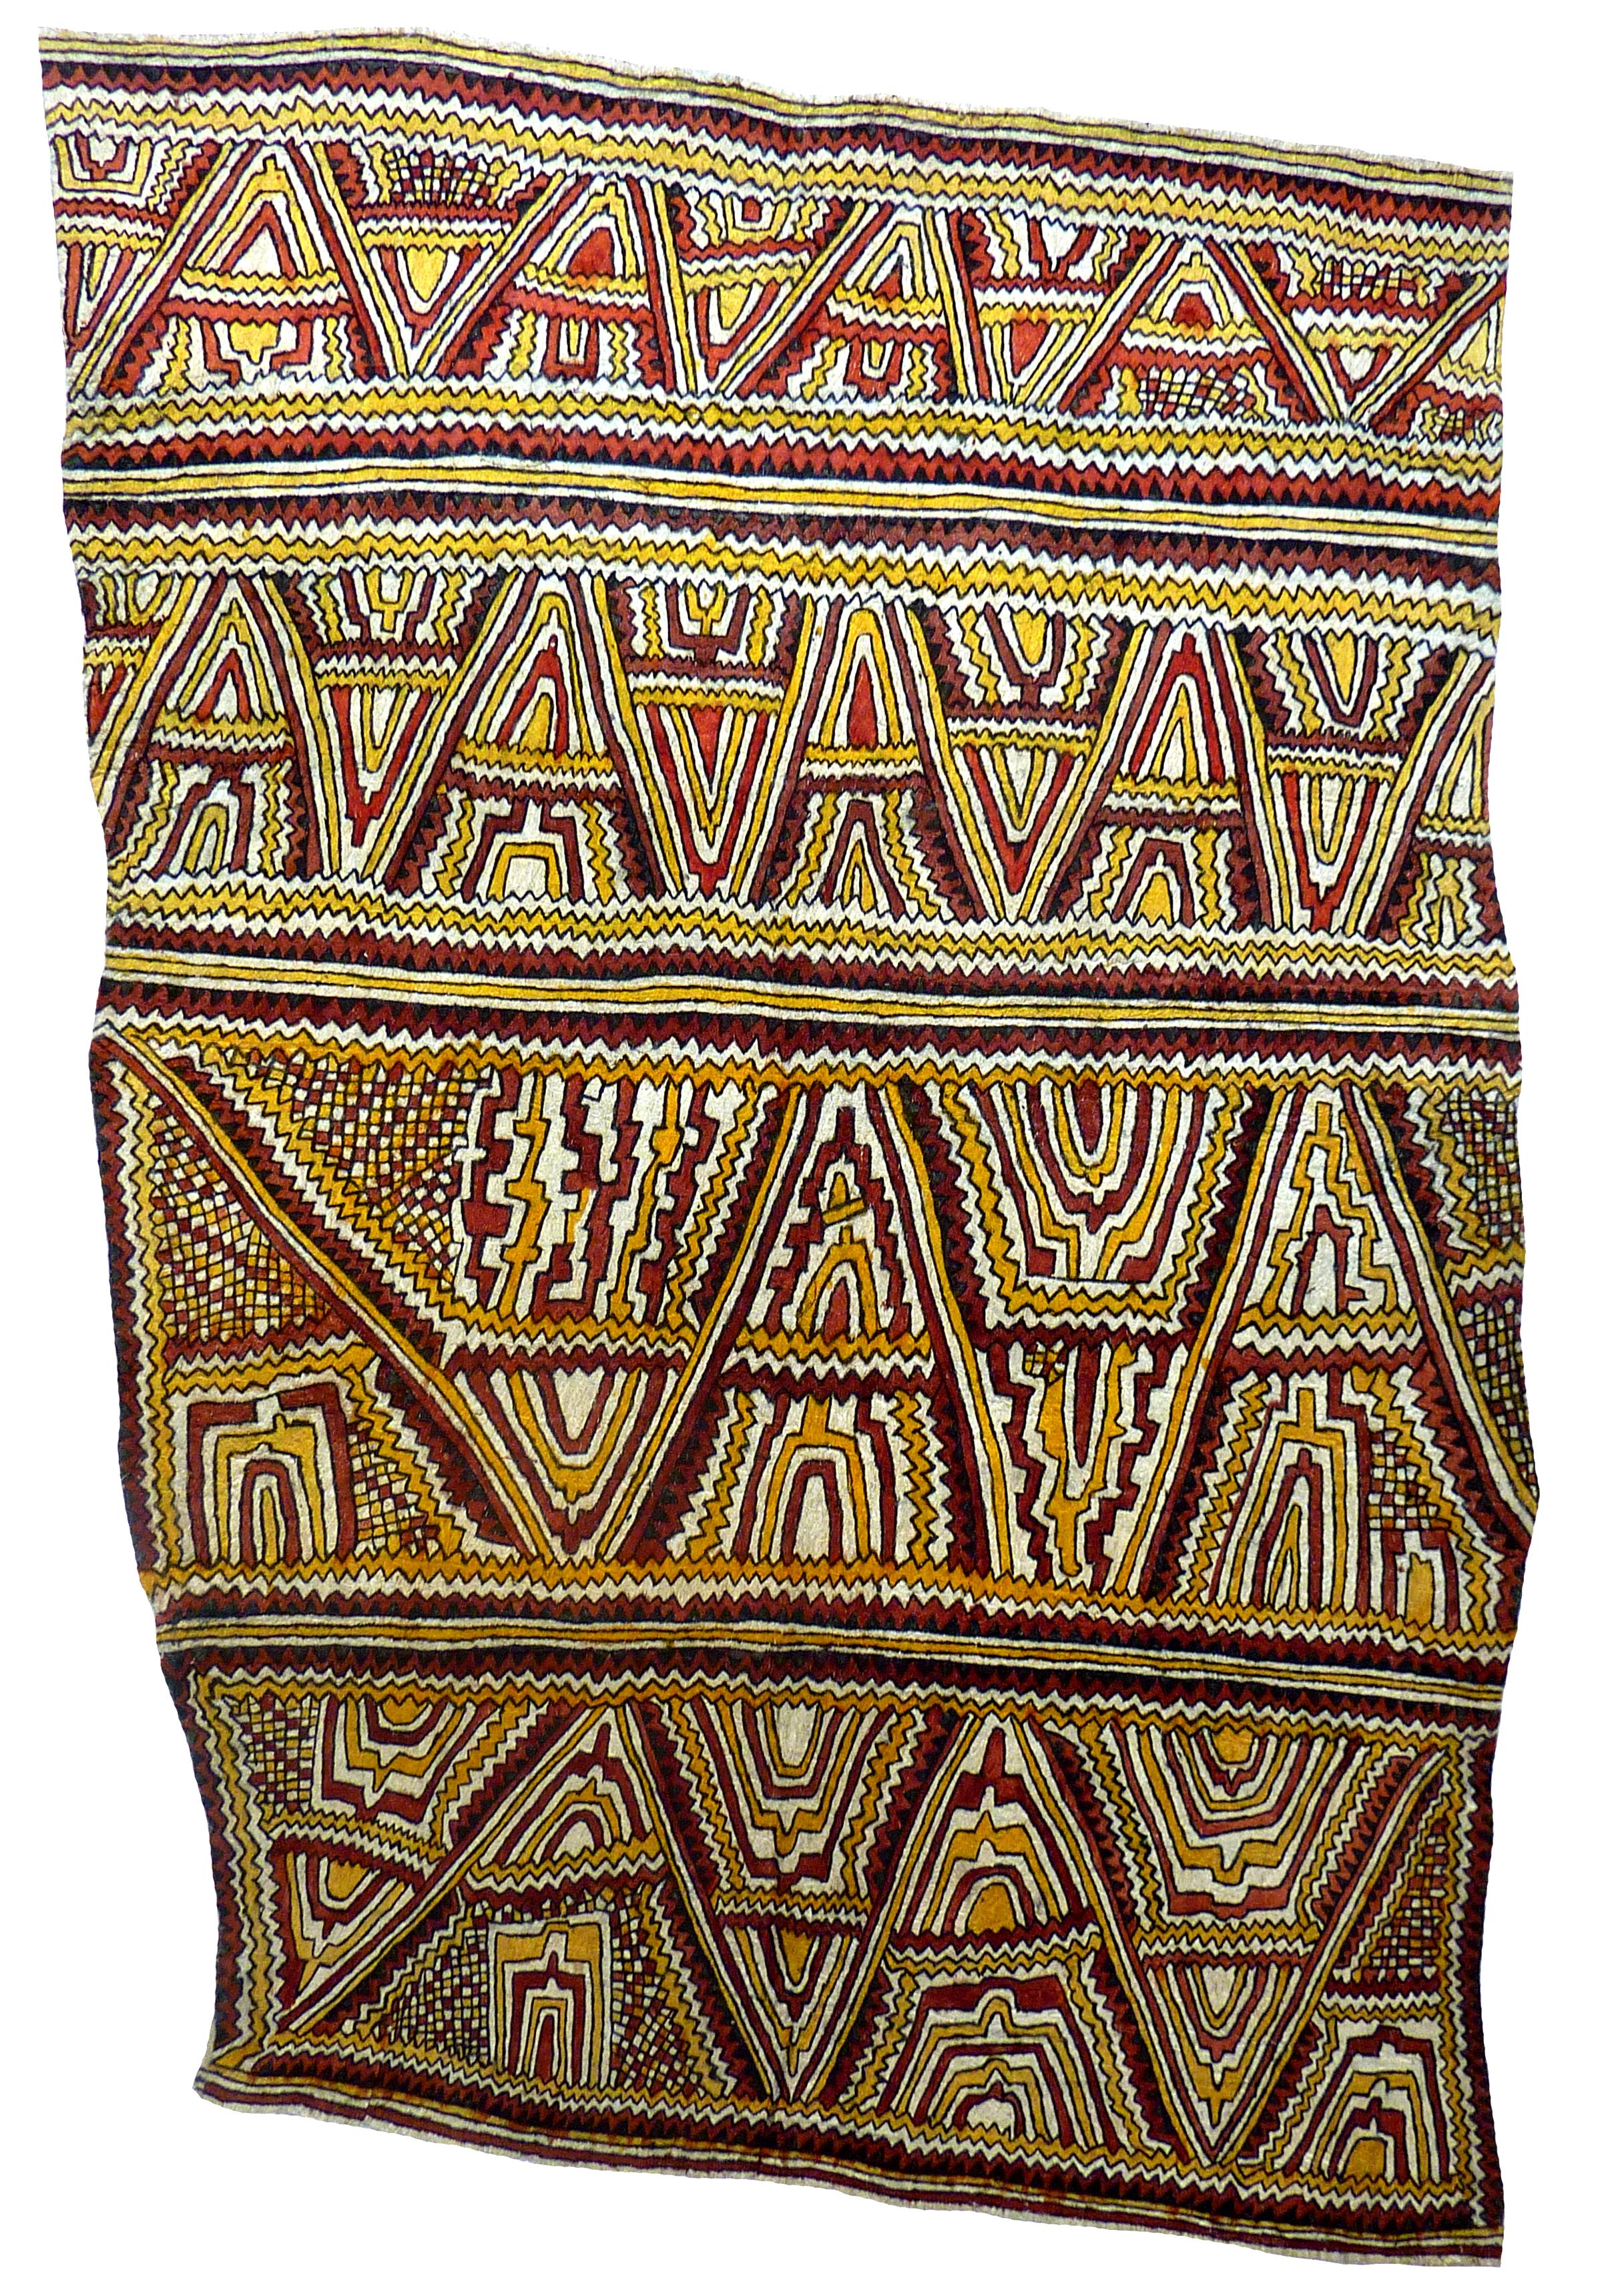 Mala Nari (Matosi)    Dahoru'e, hitai, buborianö'e ohu'o tuböre une   Omie mountains, river boulders, beaks of the Papuan Hornbill and eggs of the Dwarf Cassowary  184 x 128 cm  Natural pigments on nioge (barkcloth blanket), 2014